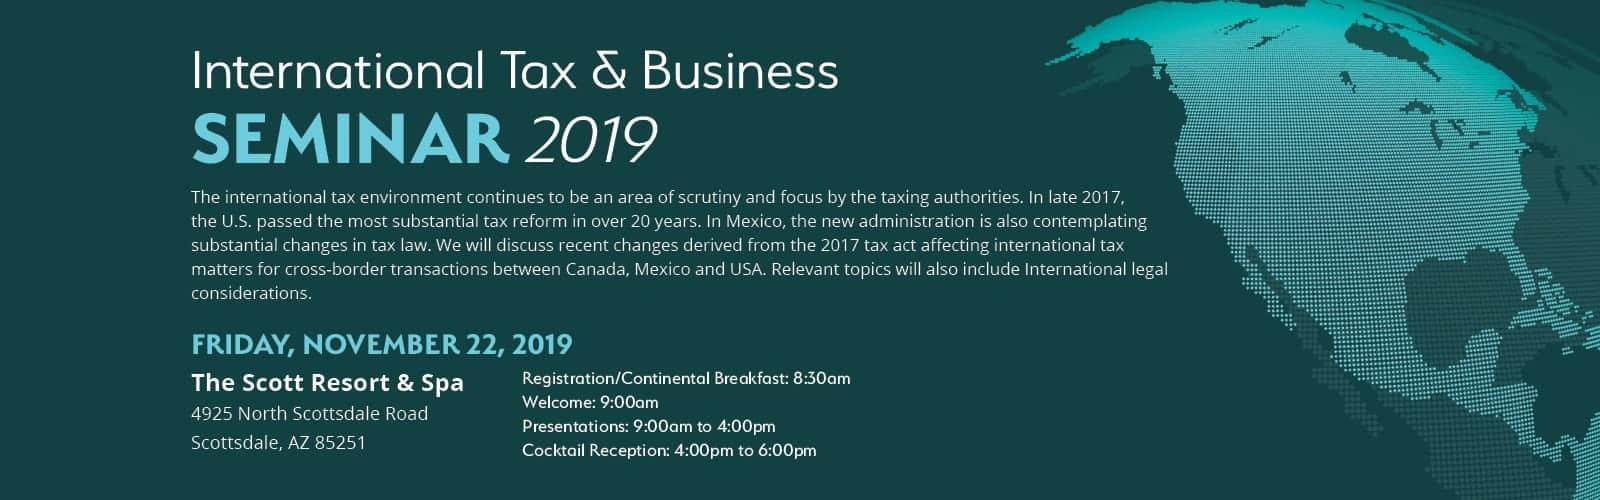 International Tax & Business Seminar 2019